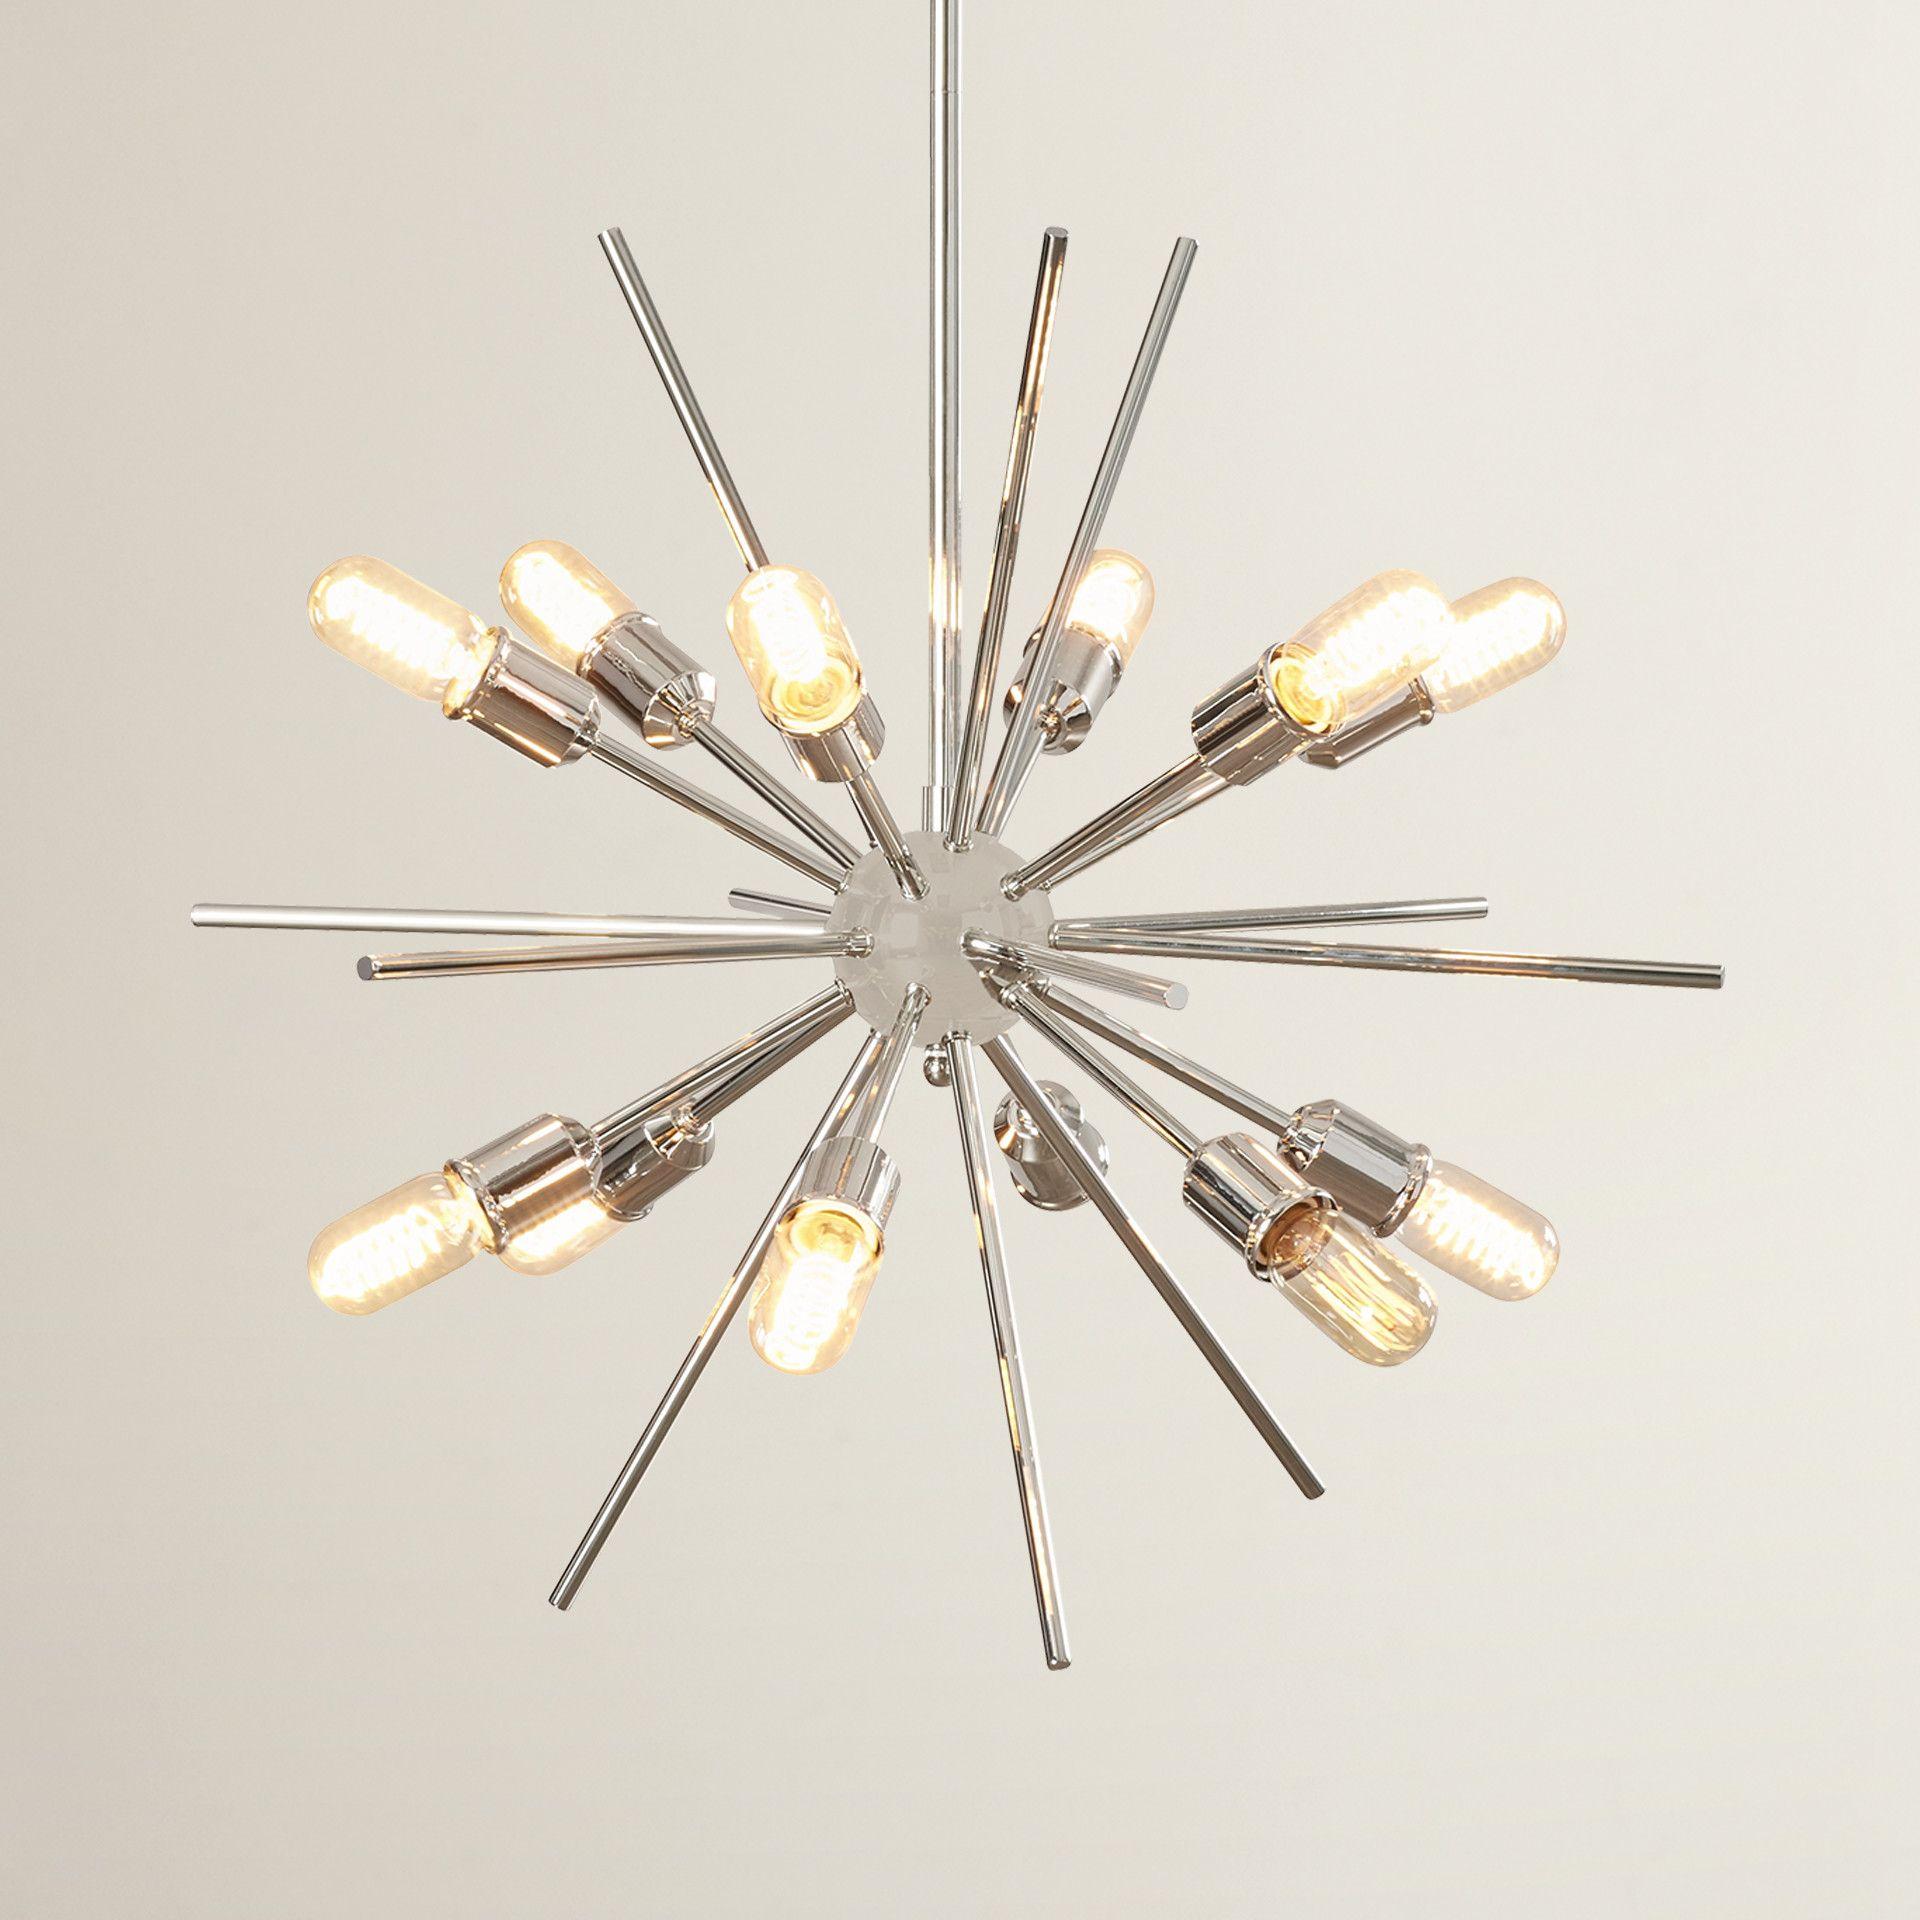 Corona 12-Light Sputnik Chandelier | Lighting | Sputnik pertaining to Corona 12-Light Sputnik Chandeliers (Image 13 of 30)